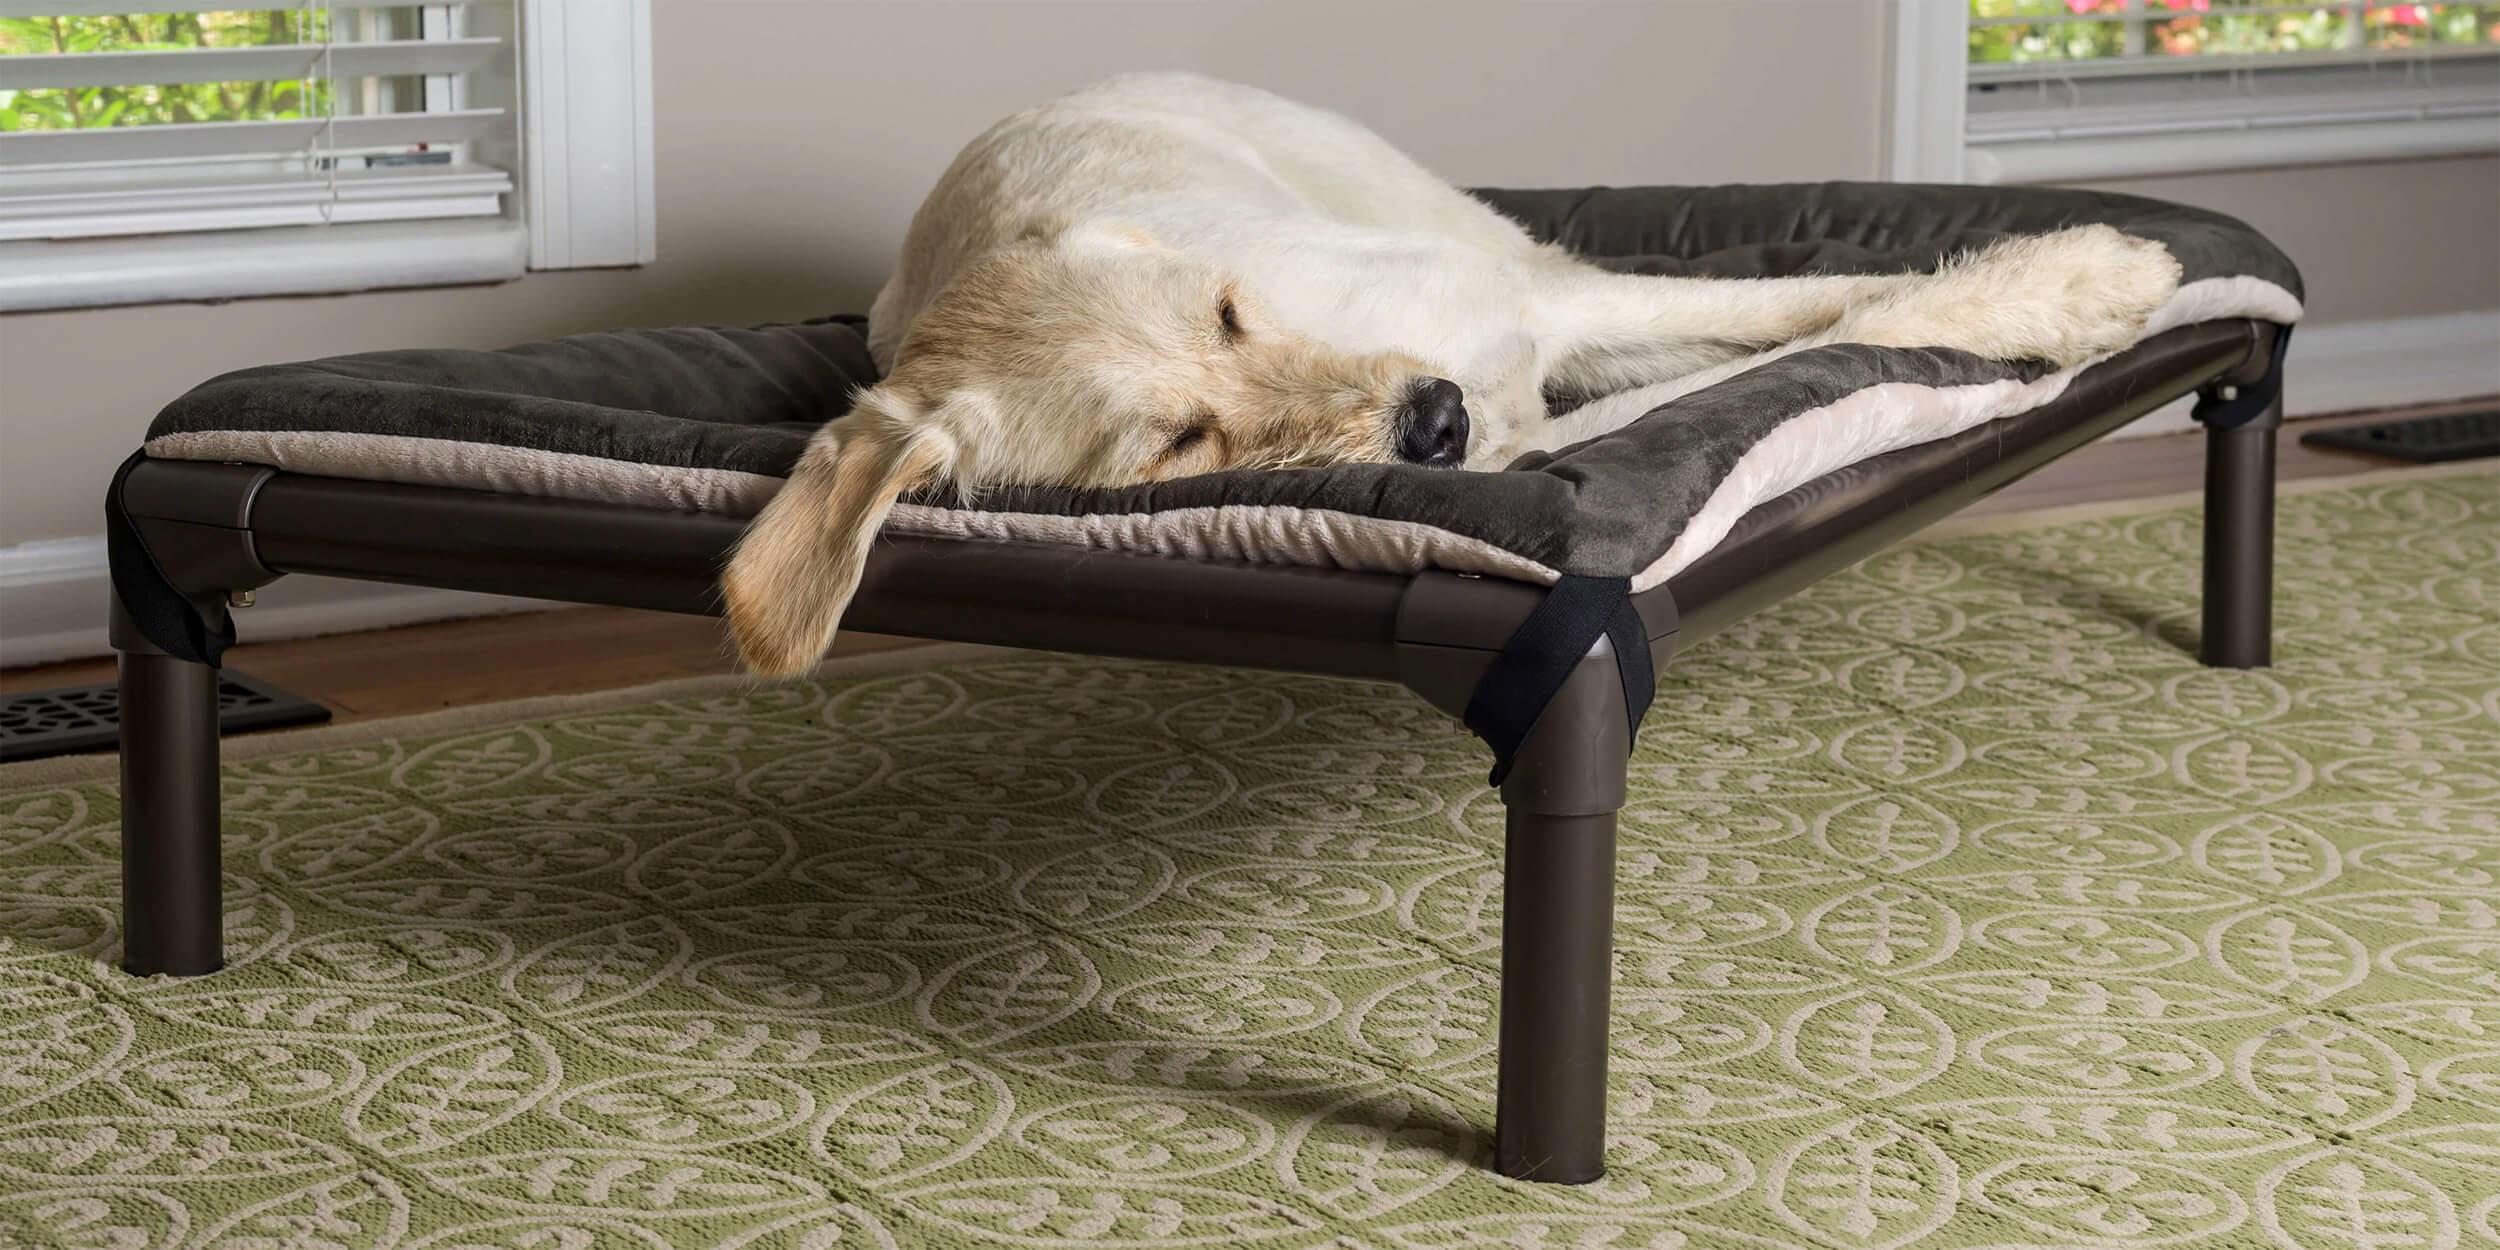 Kuranda Dog Amp Cat Beds